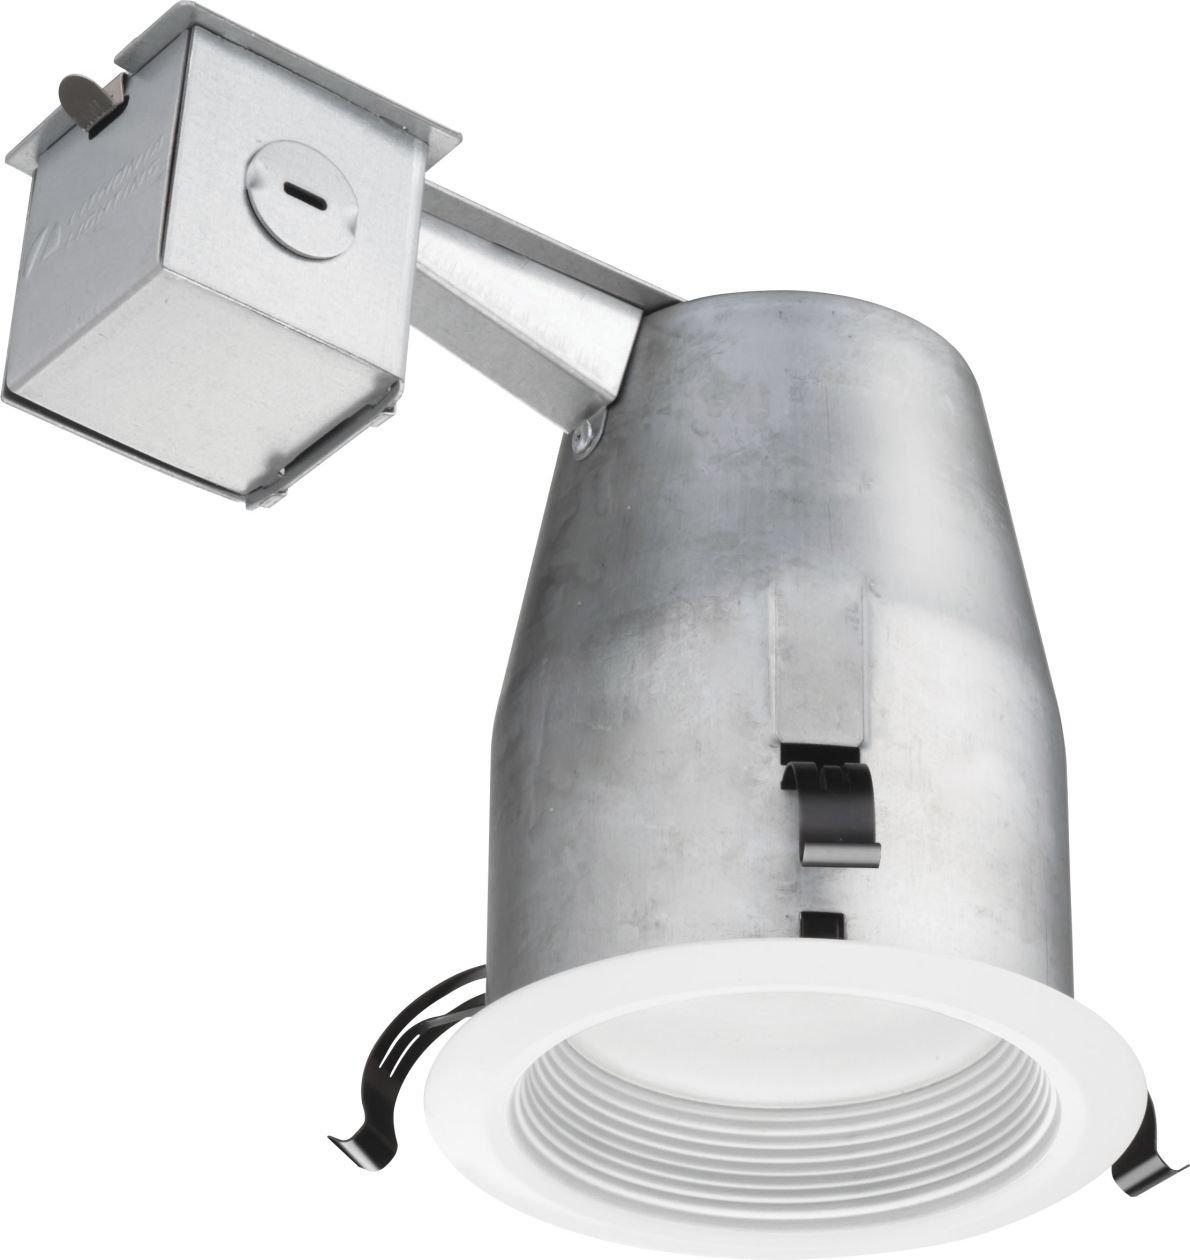 Lithonia LK4BPMW LED M4 Recessed Kit